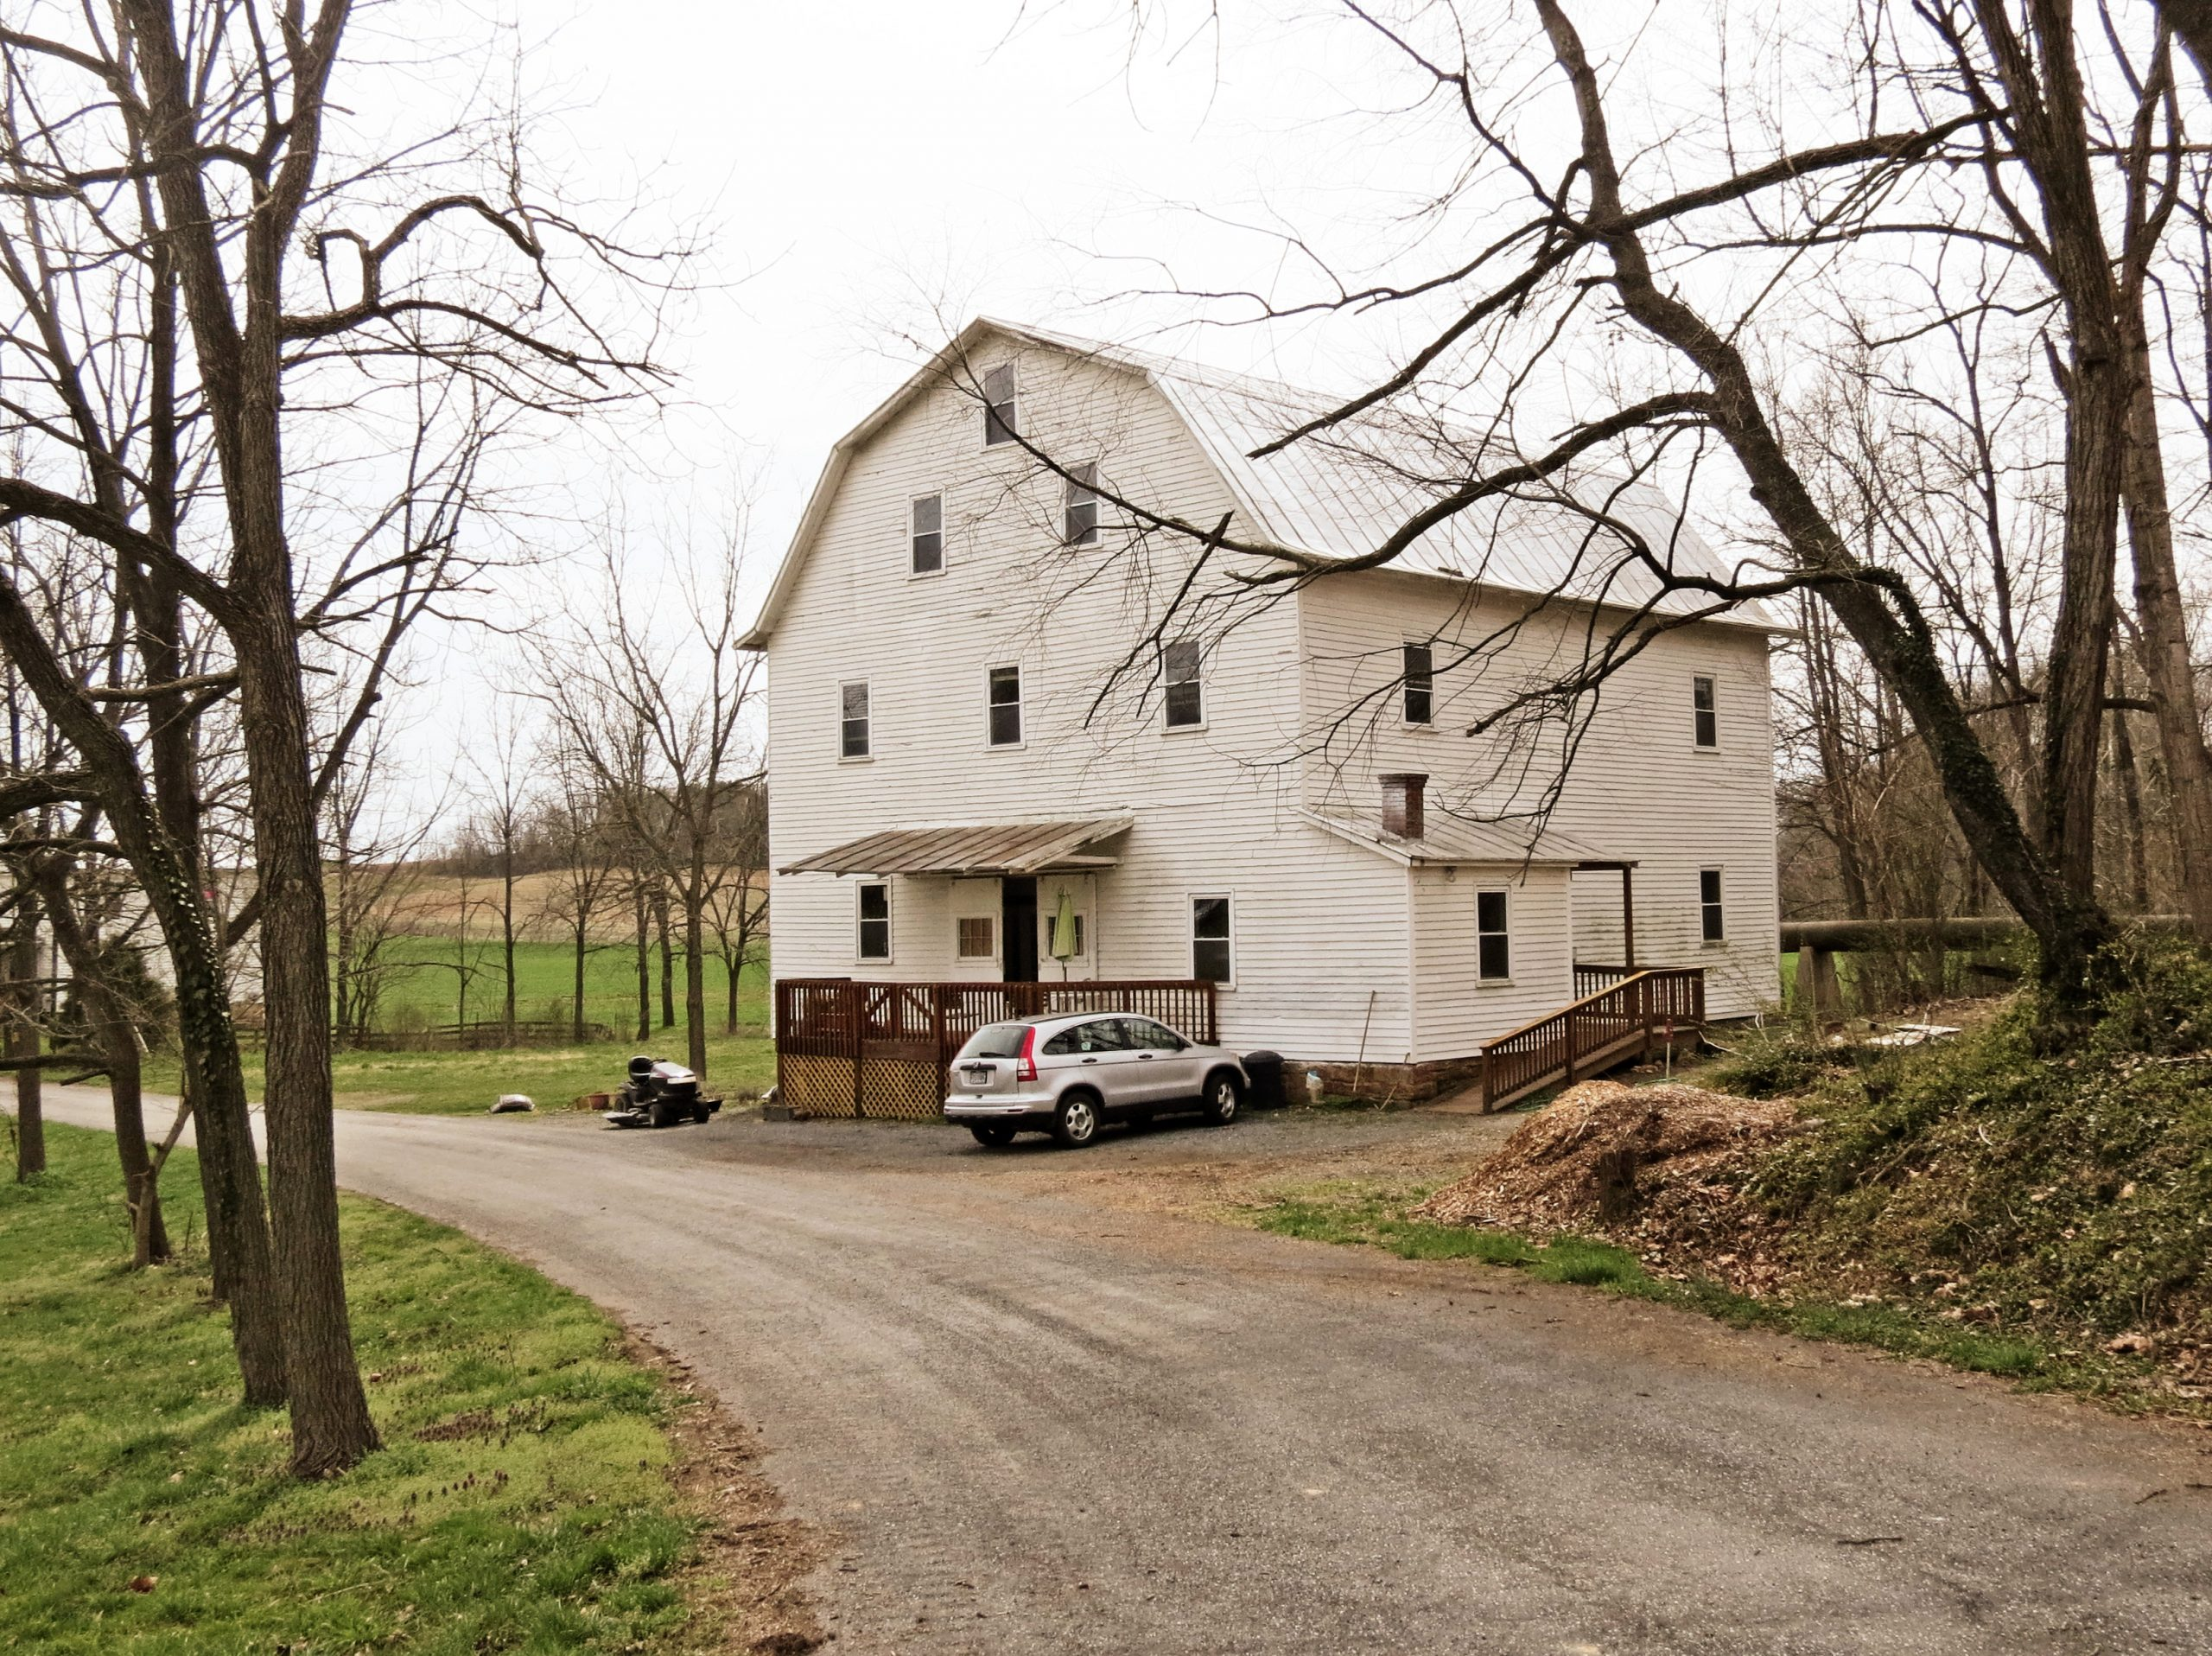 Paul's Ottobine Mill